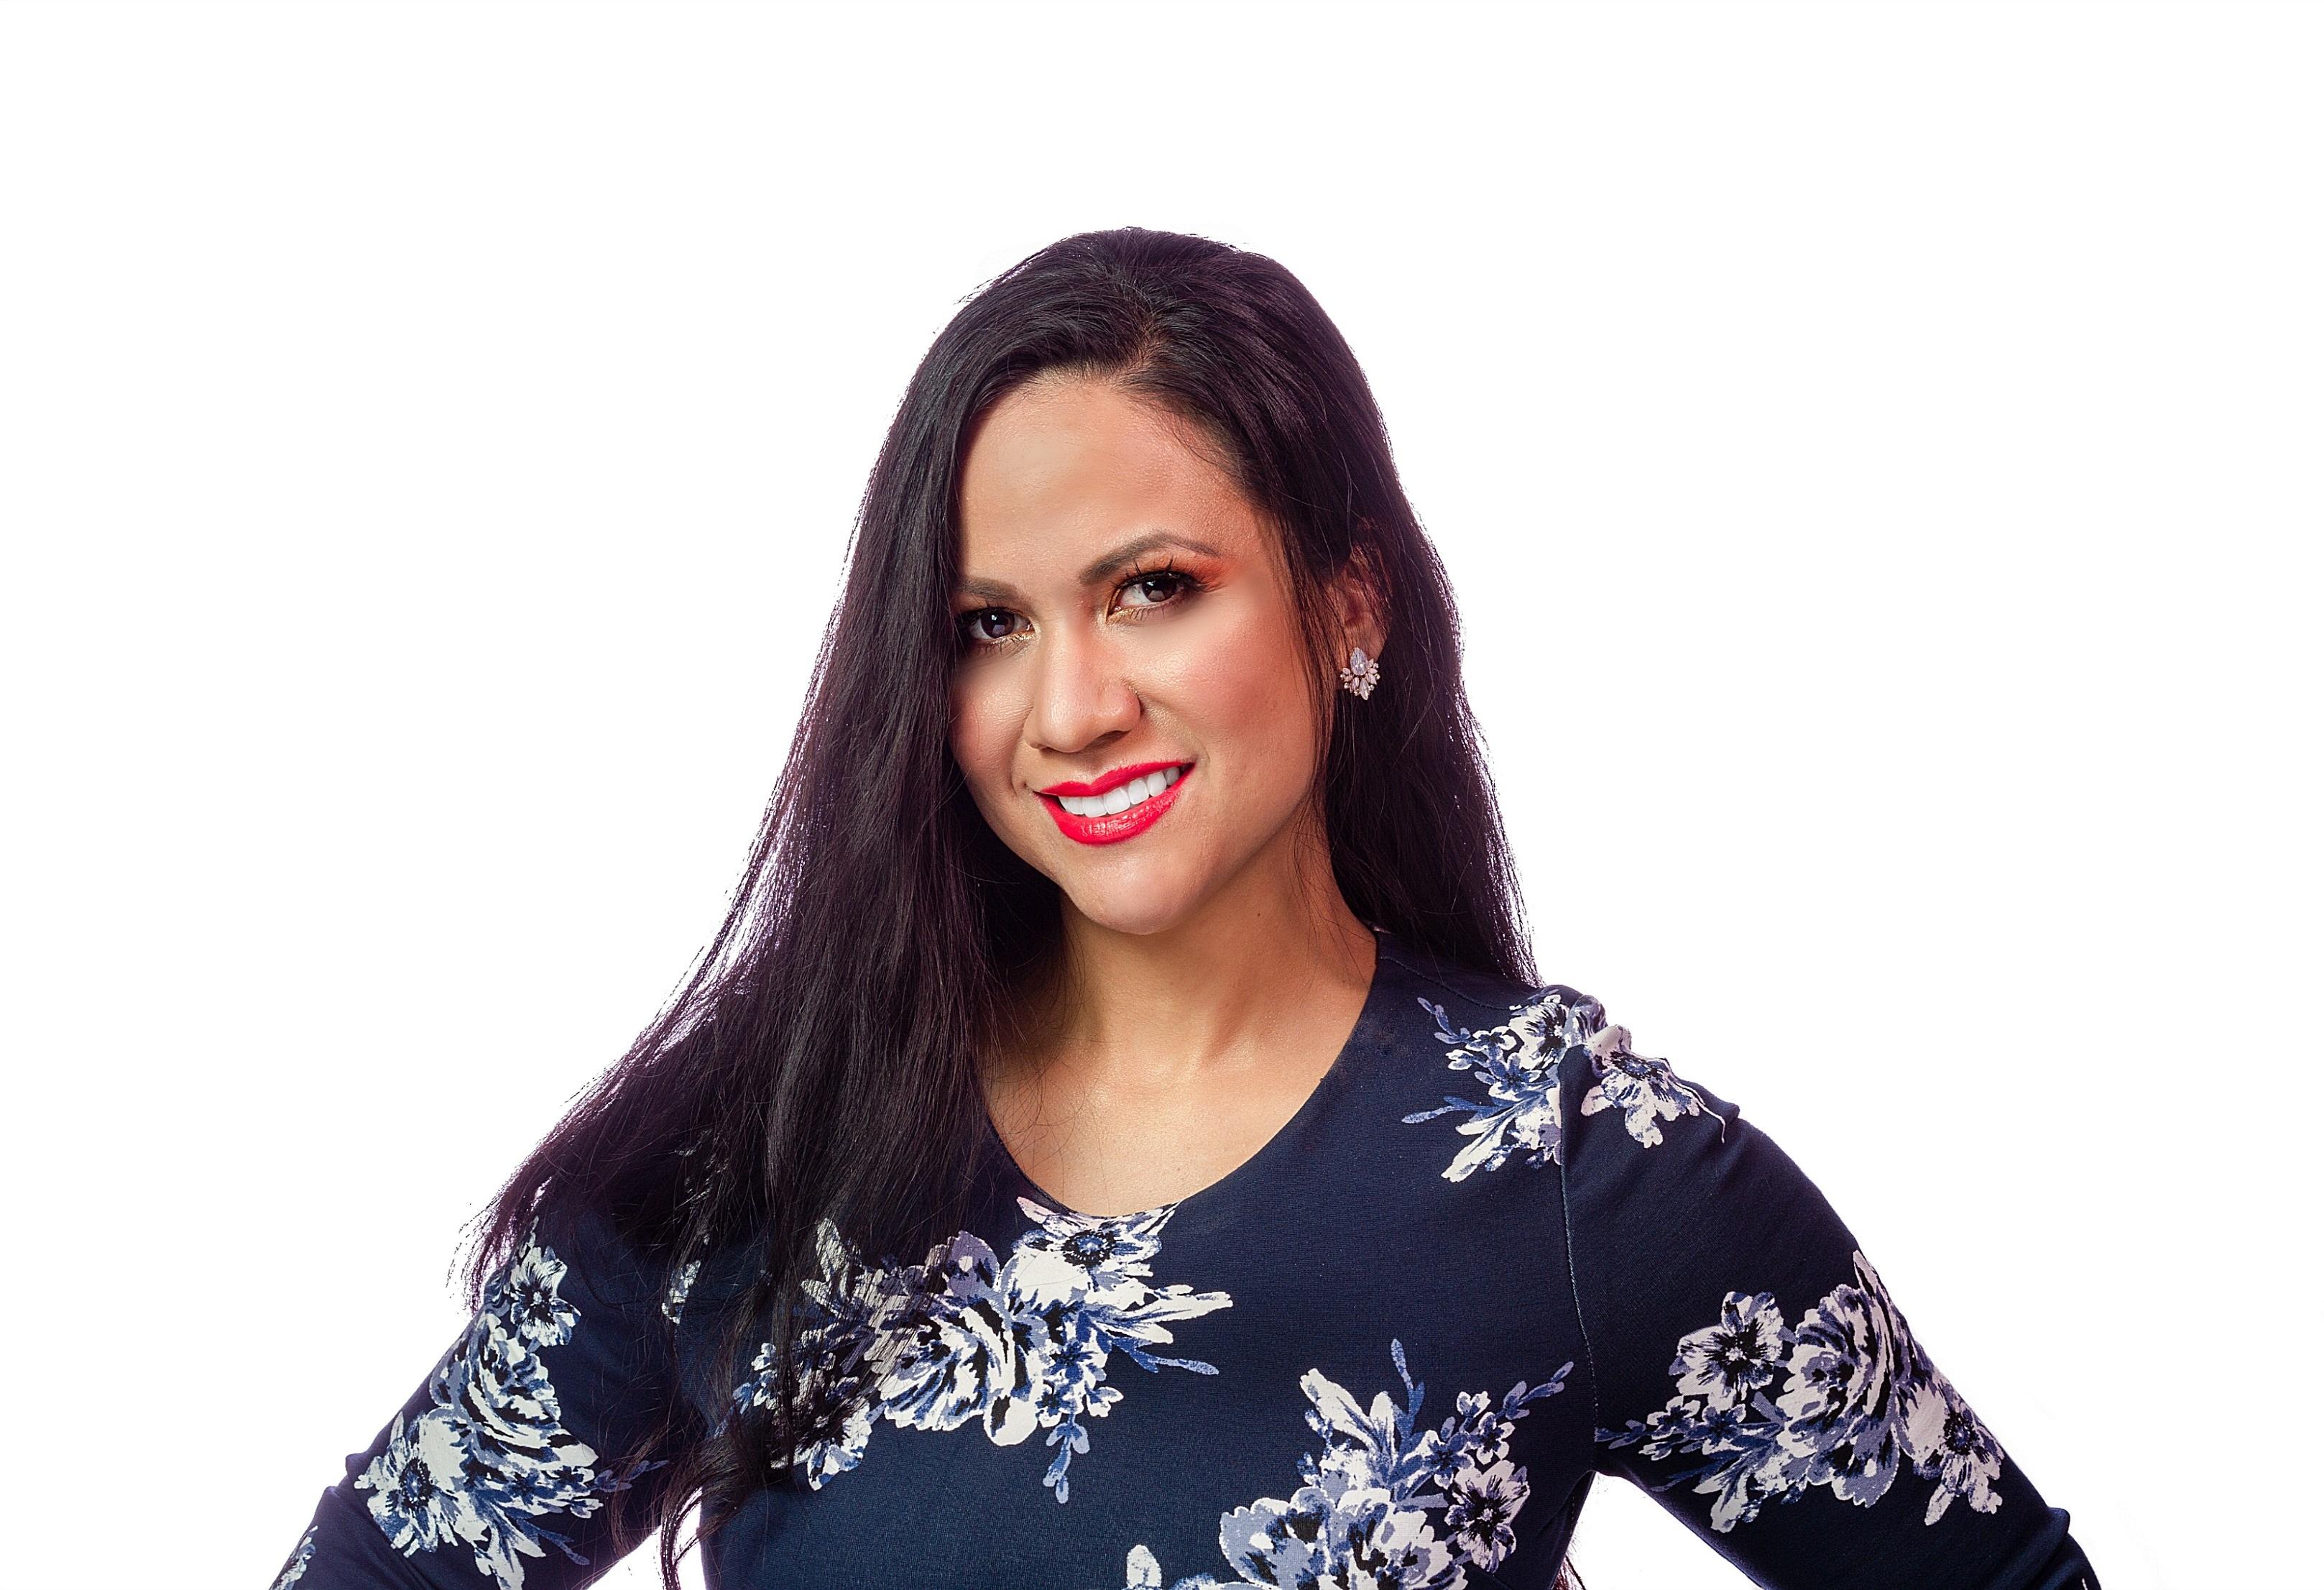 Amanda Barela